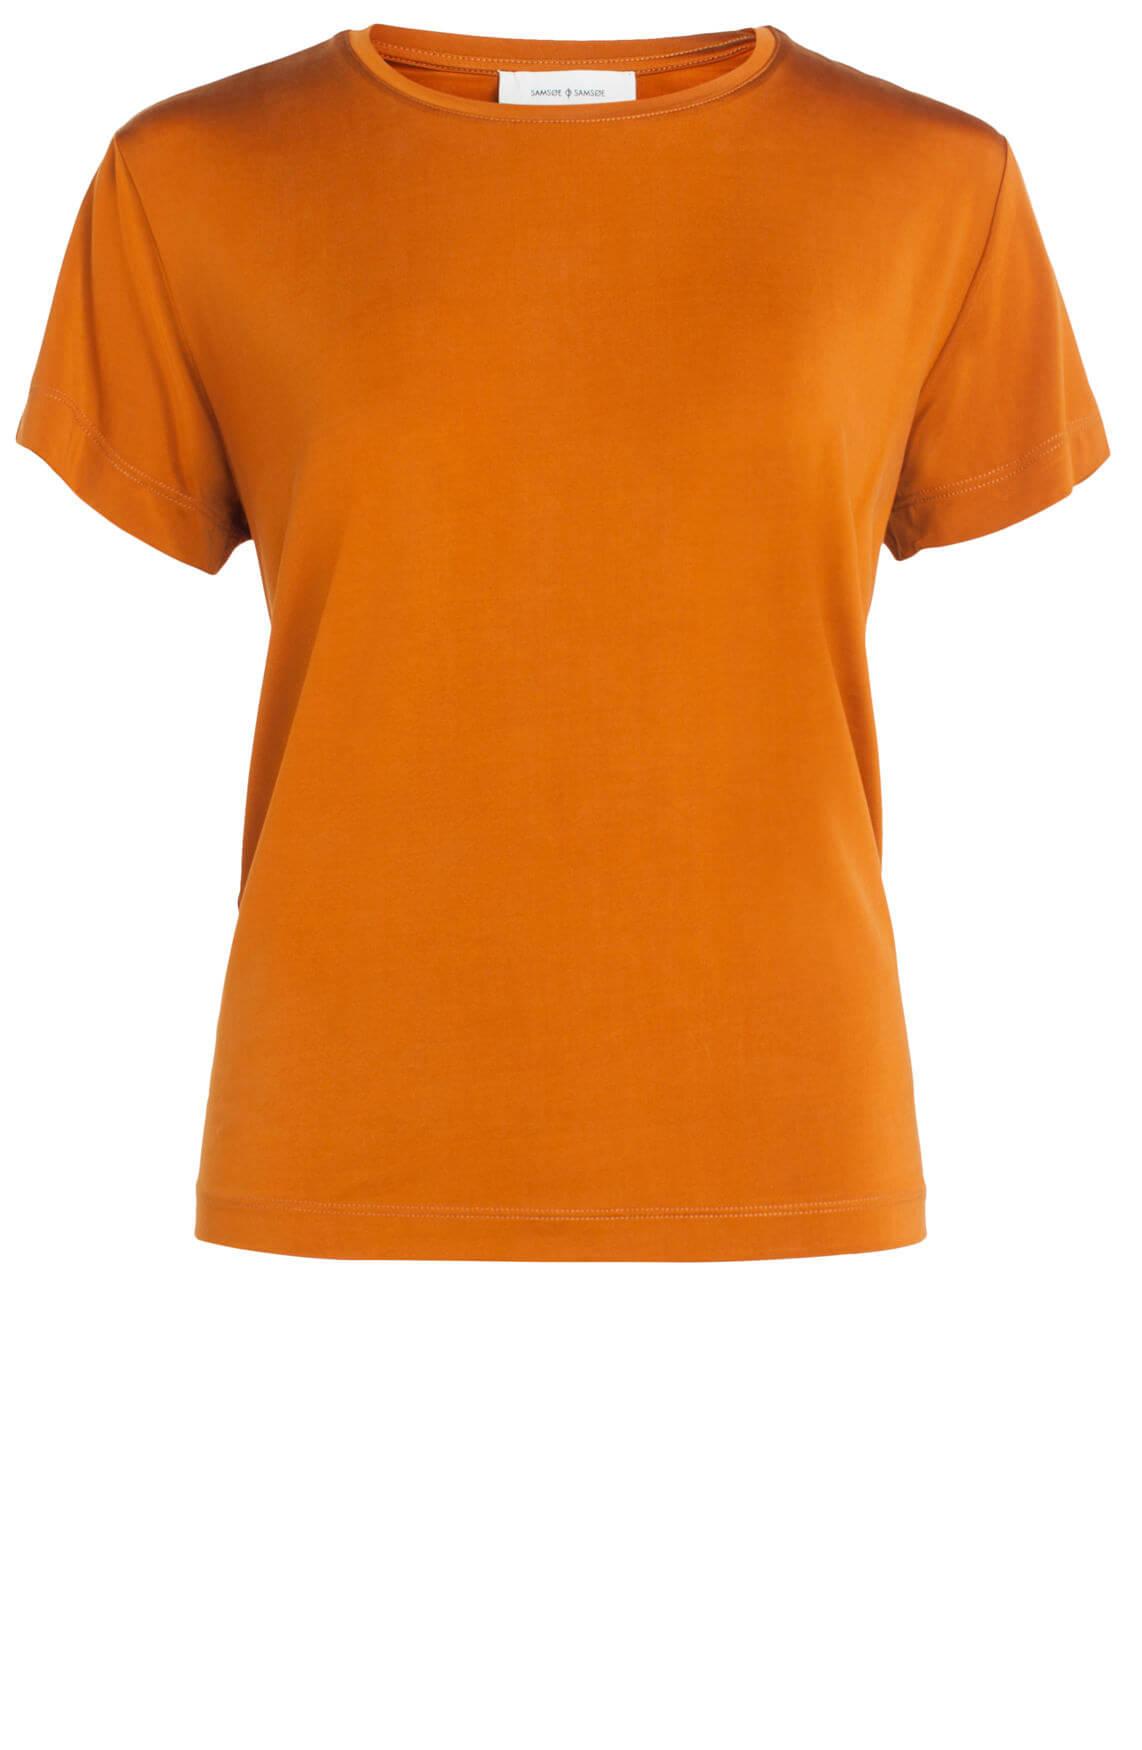 Samsoe Samsoe Dames Siff cupro shirt Bruin